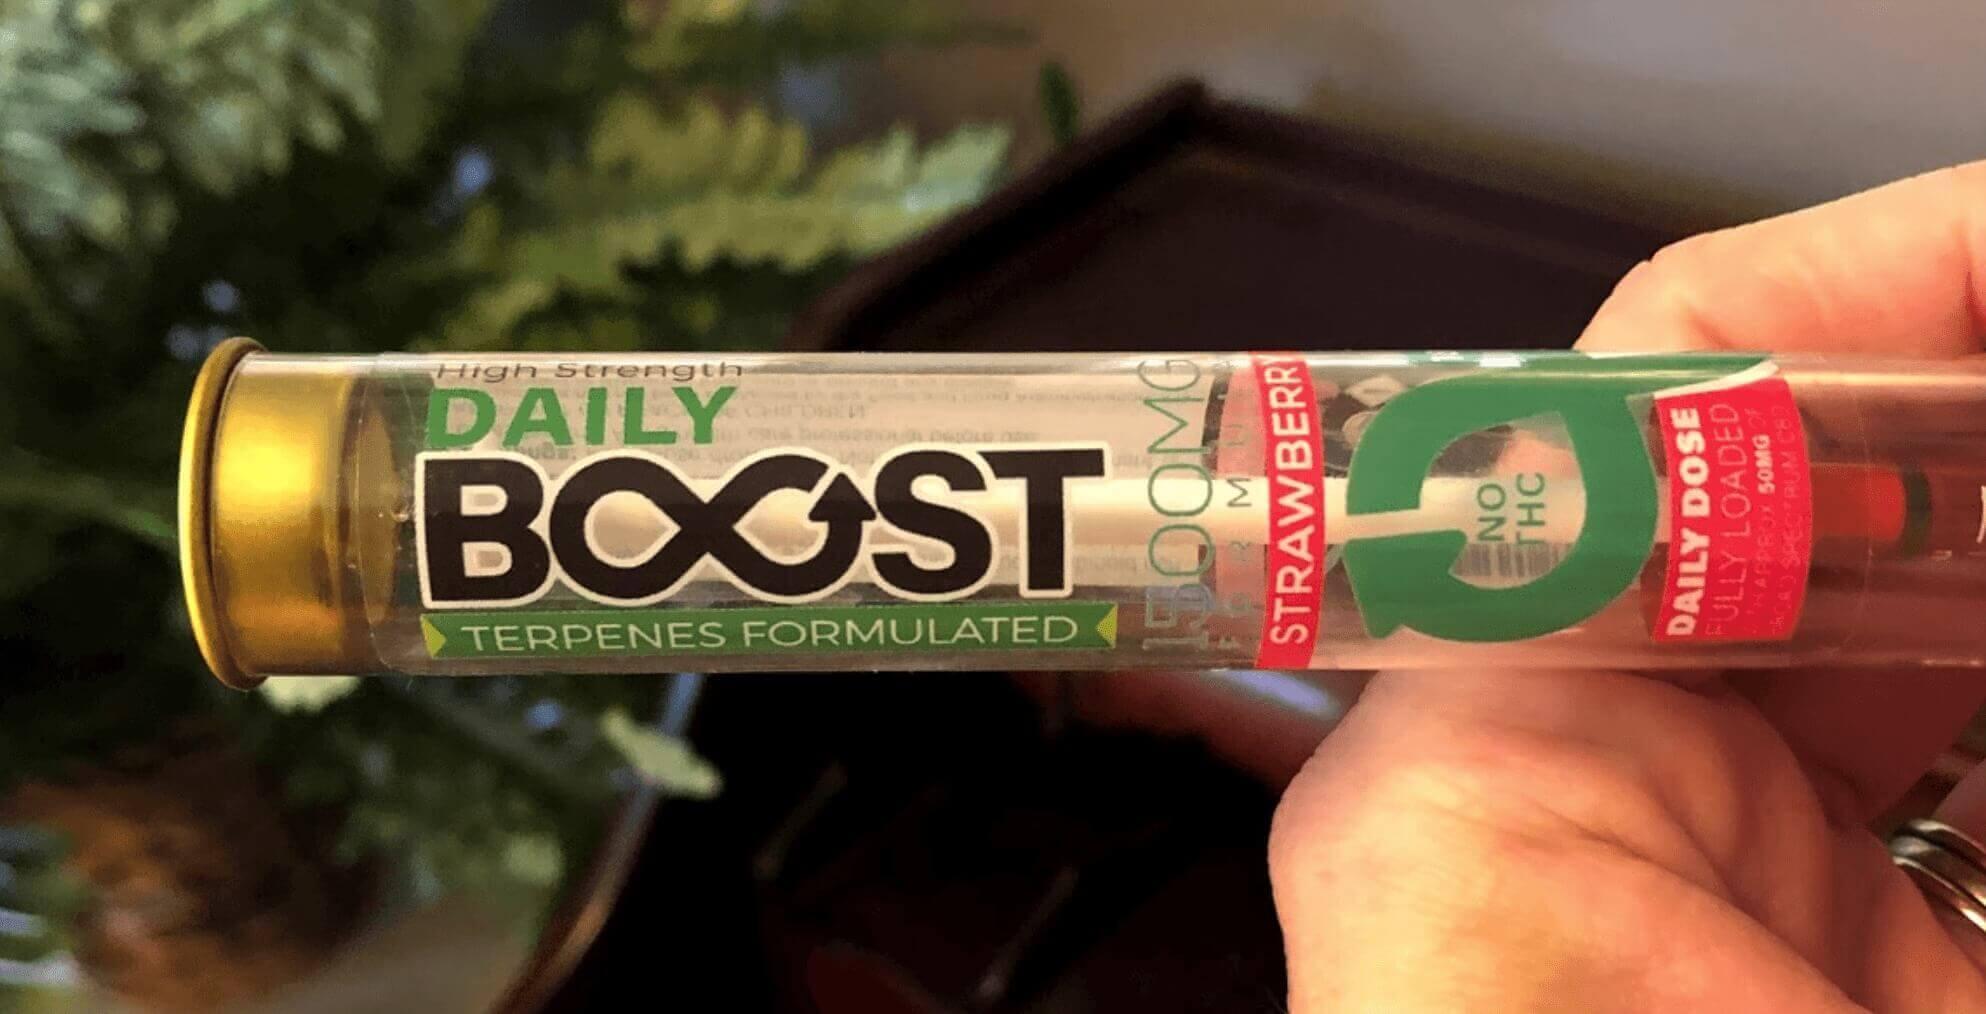 Diamond CBD Daily Boost CBD Oils Review image 14